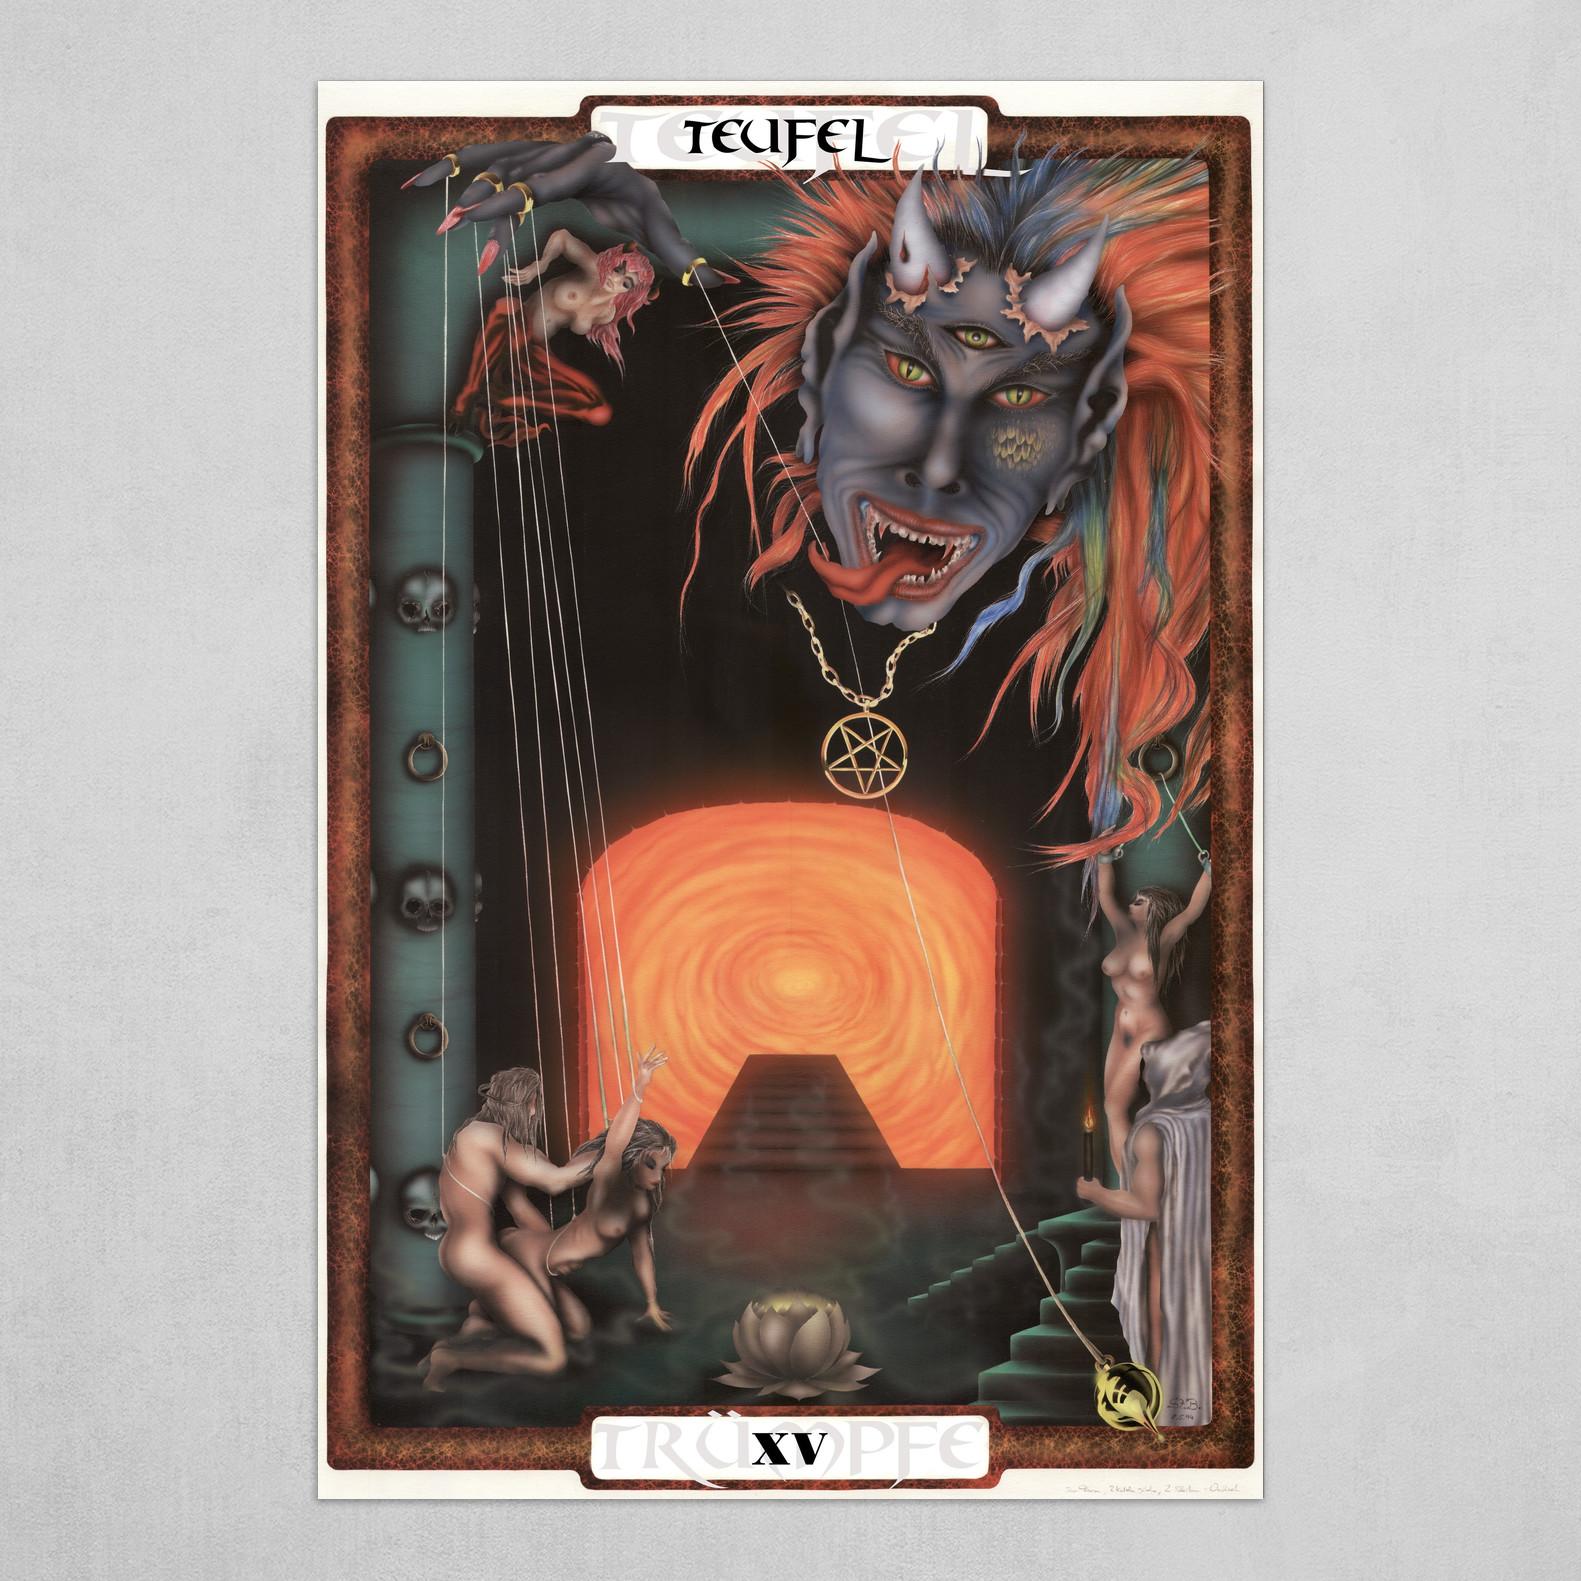 Der Teufel - The Devil